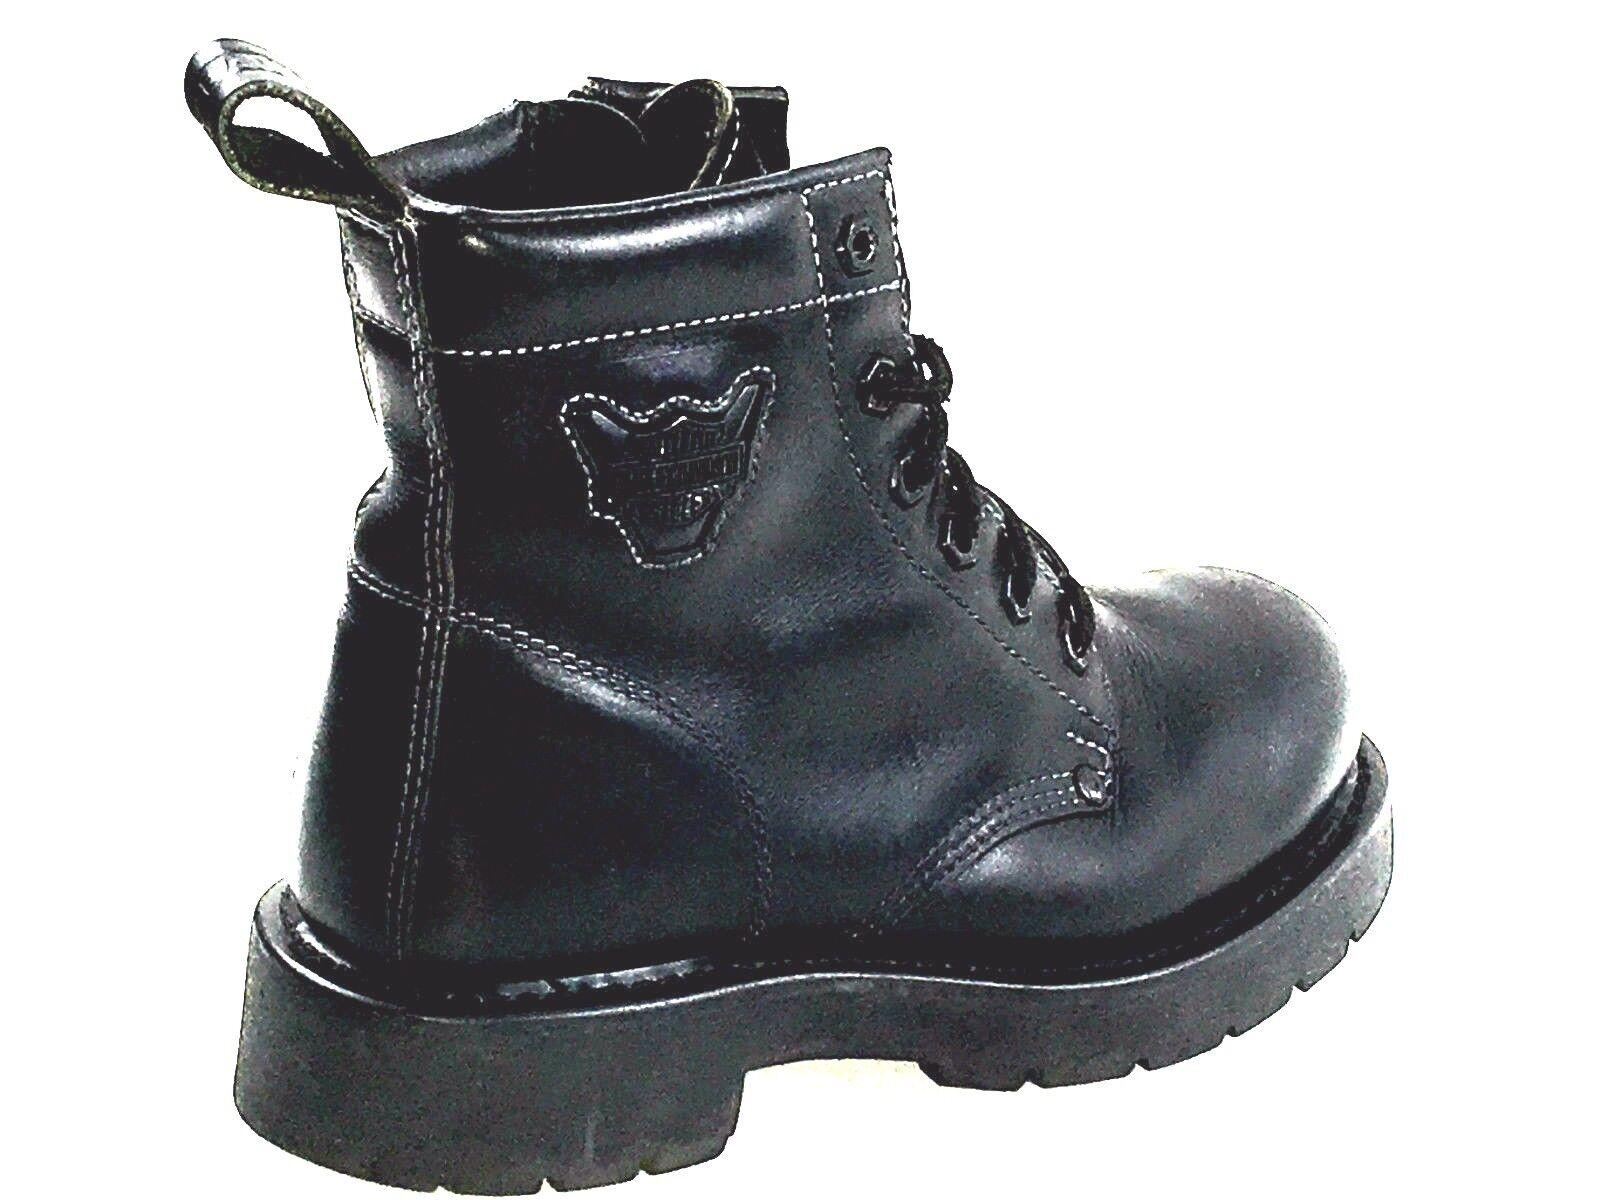 Harley Davidson Zipper Sides Boots Black Men's Size 7 Usa. Wns. Size 9 US